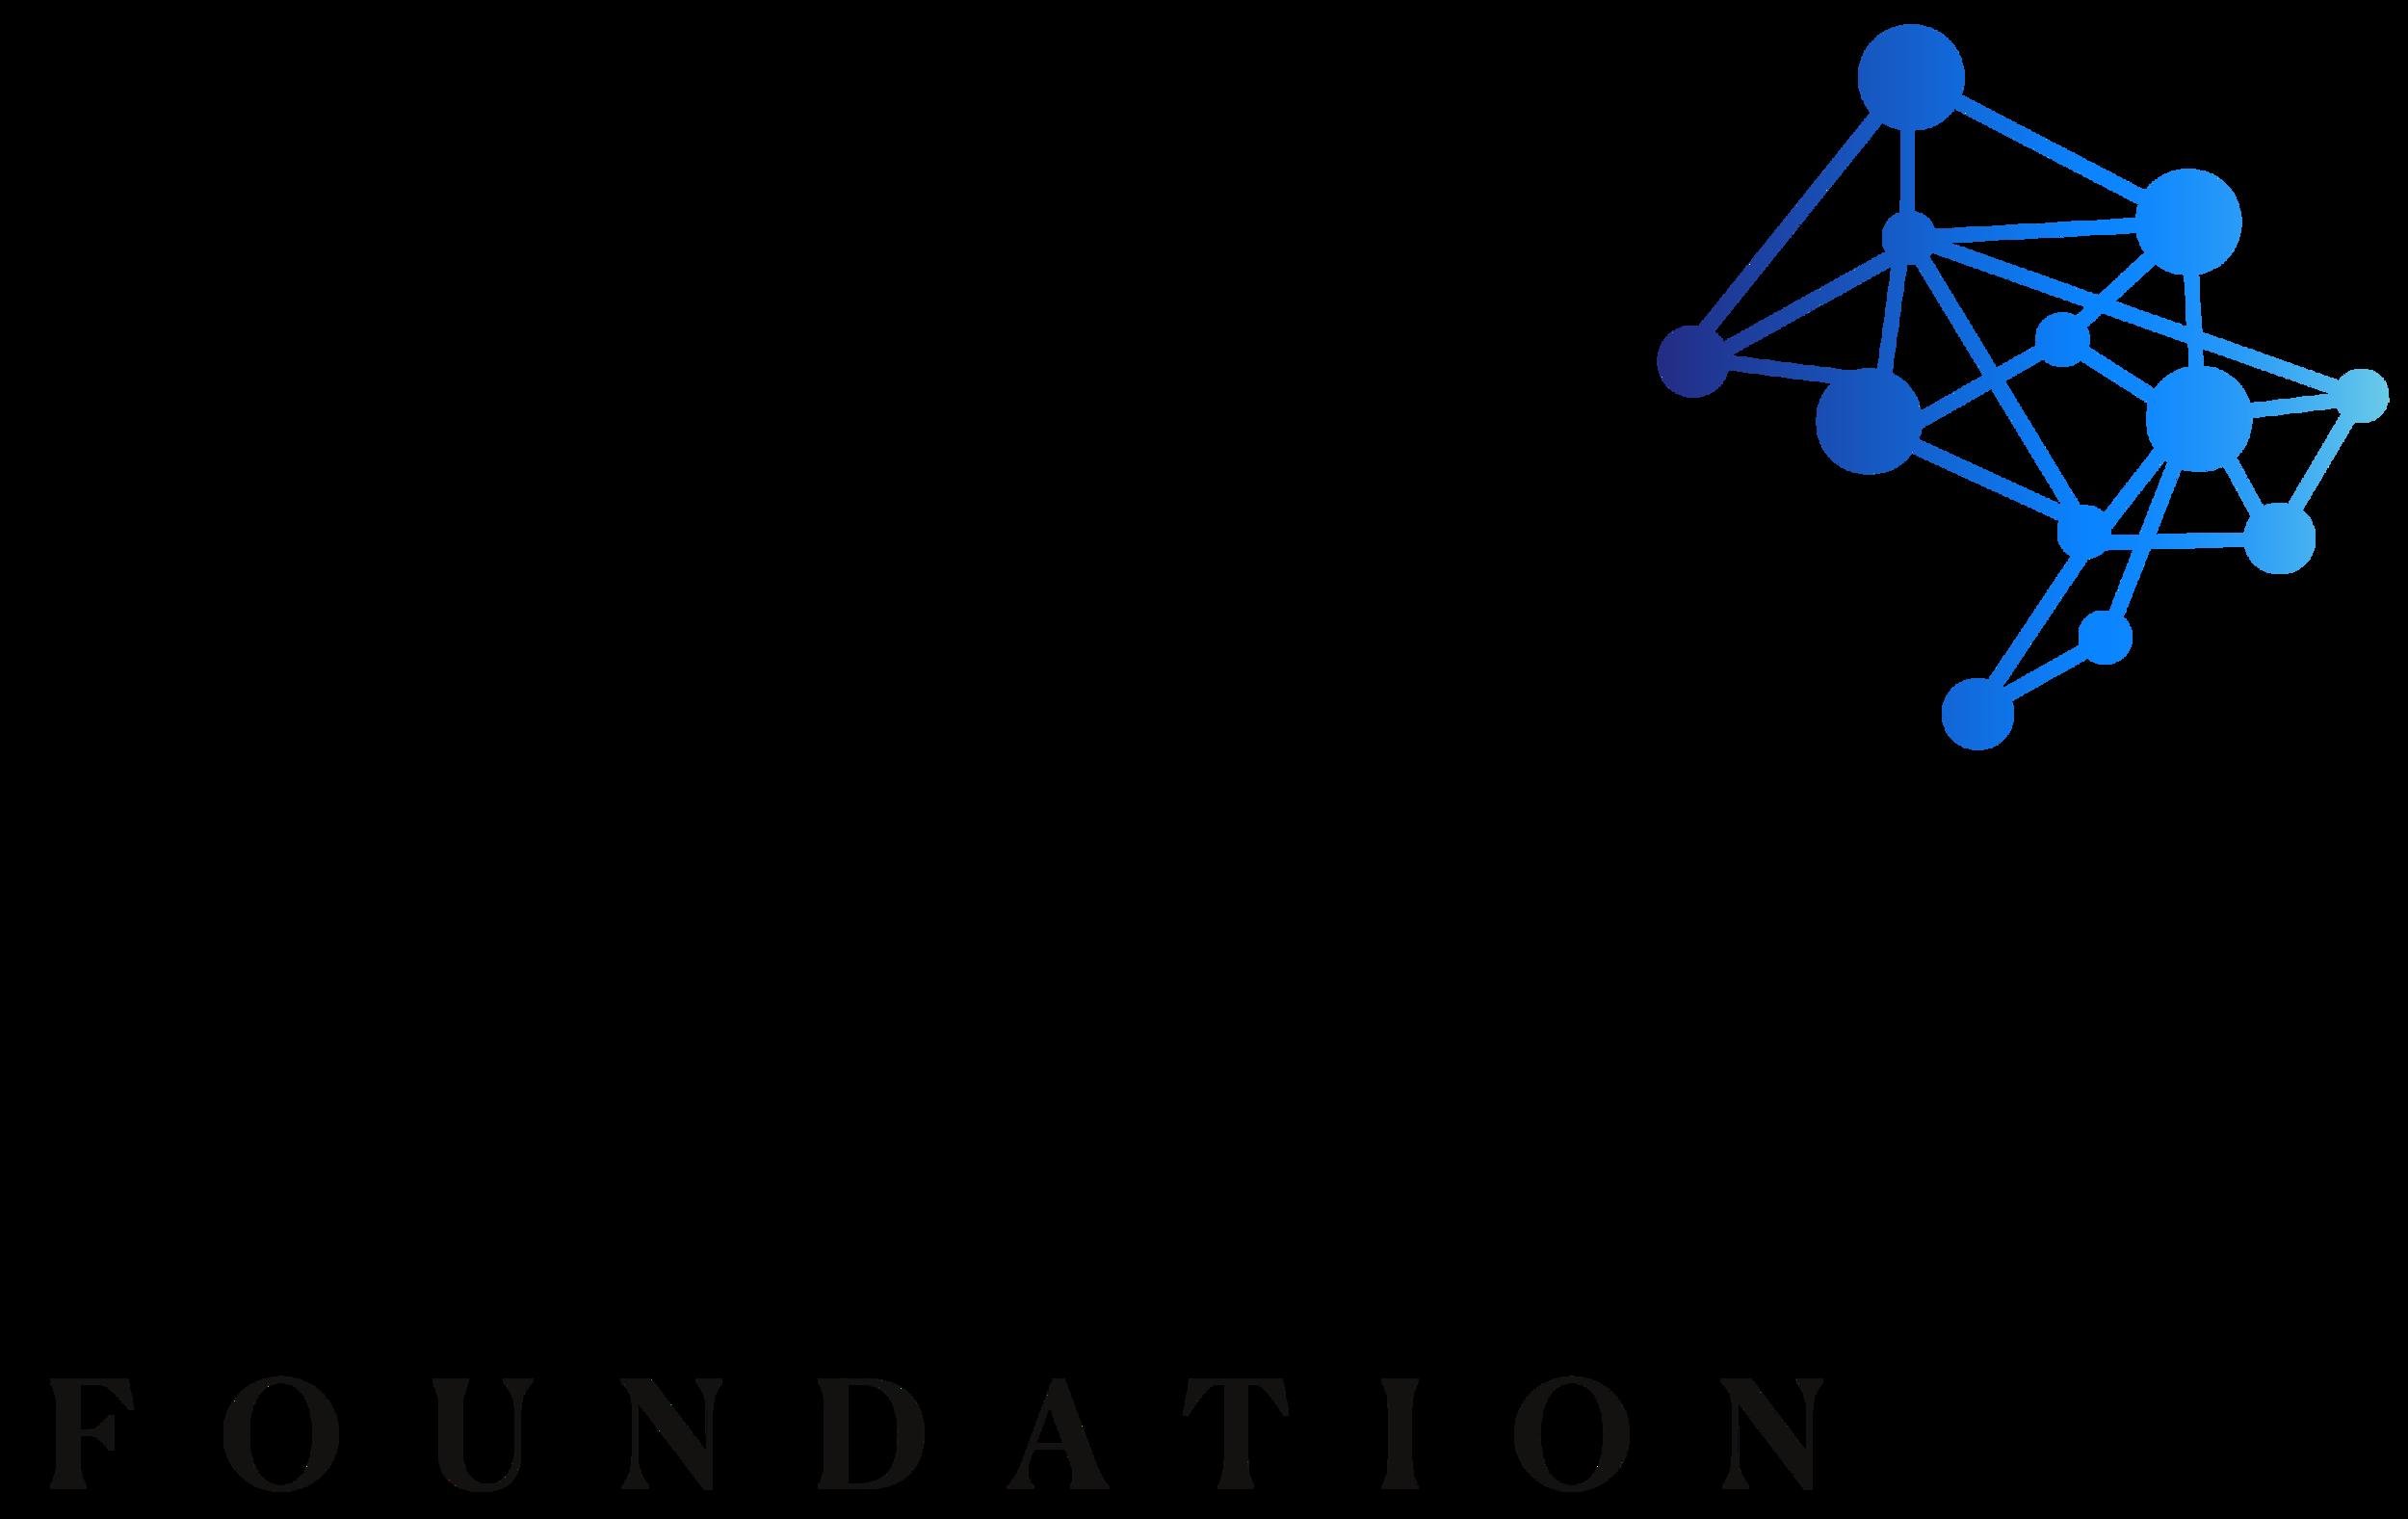 1907 Foundation